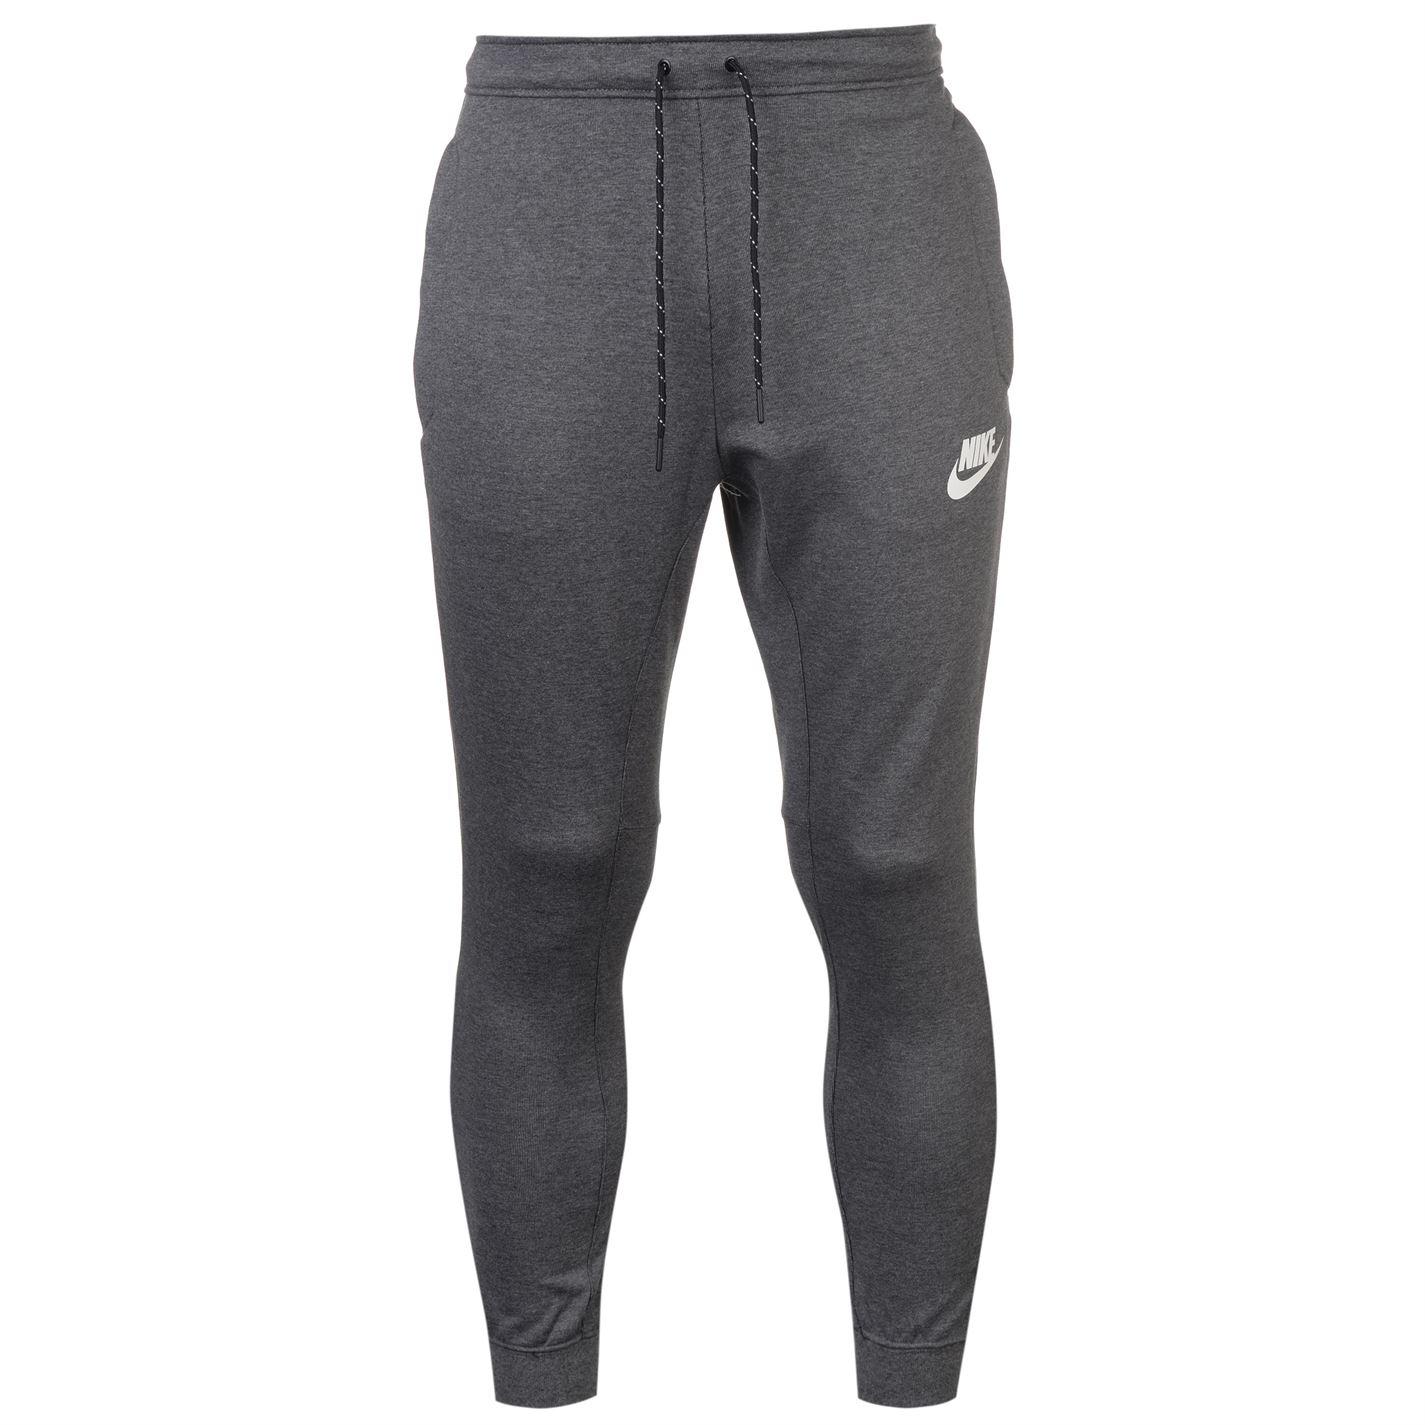 Pantaloni jogging Nike A15 pentru Barbati gri carbune